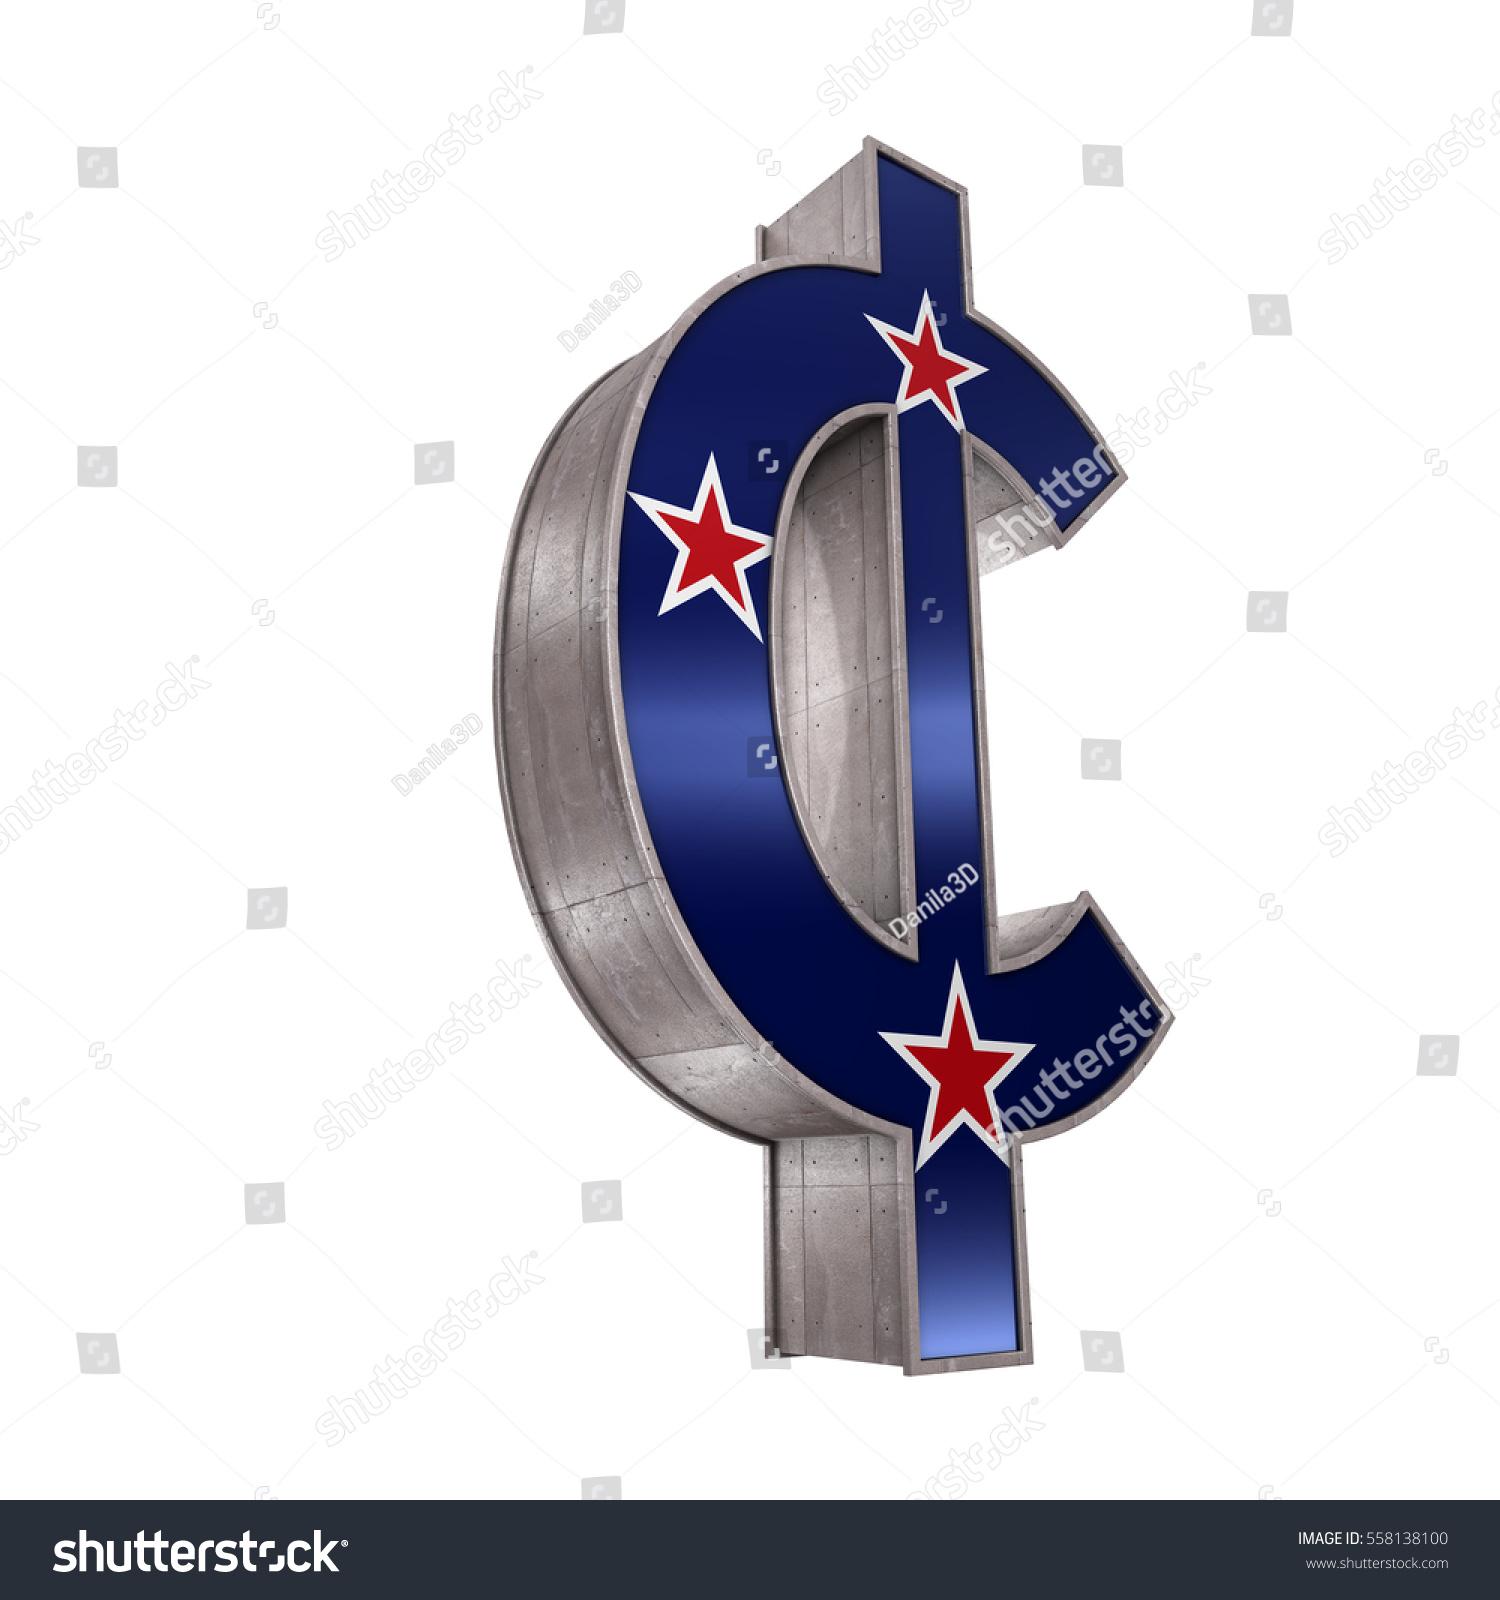 Golden Cent Symbol Isolated On White Background Stock ...  White Cent Sign